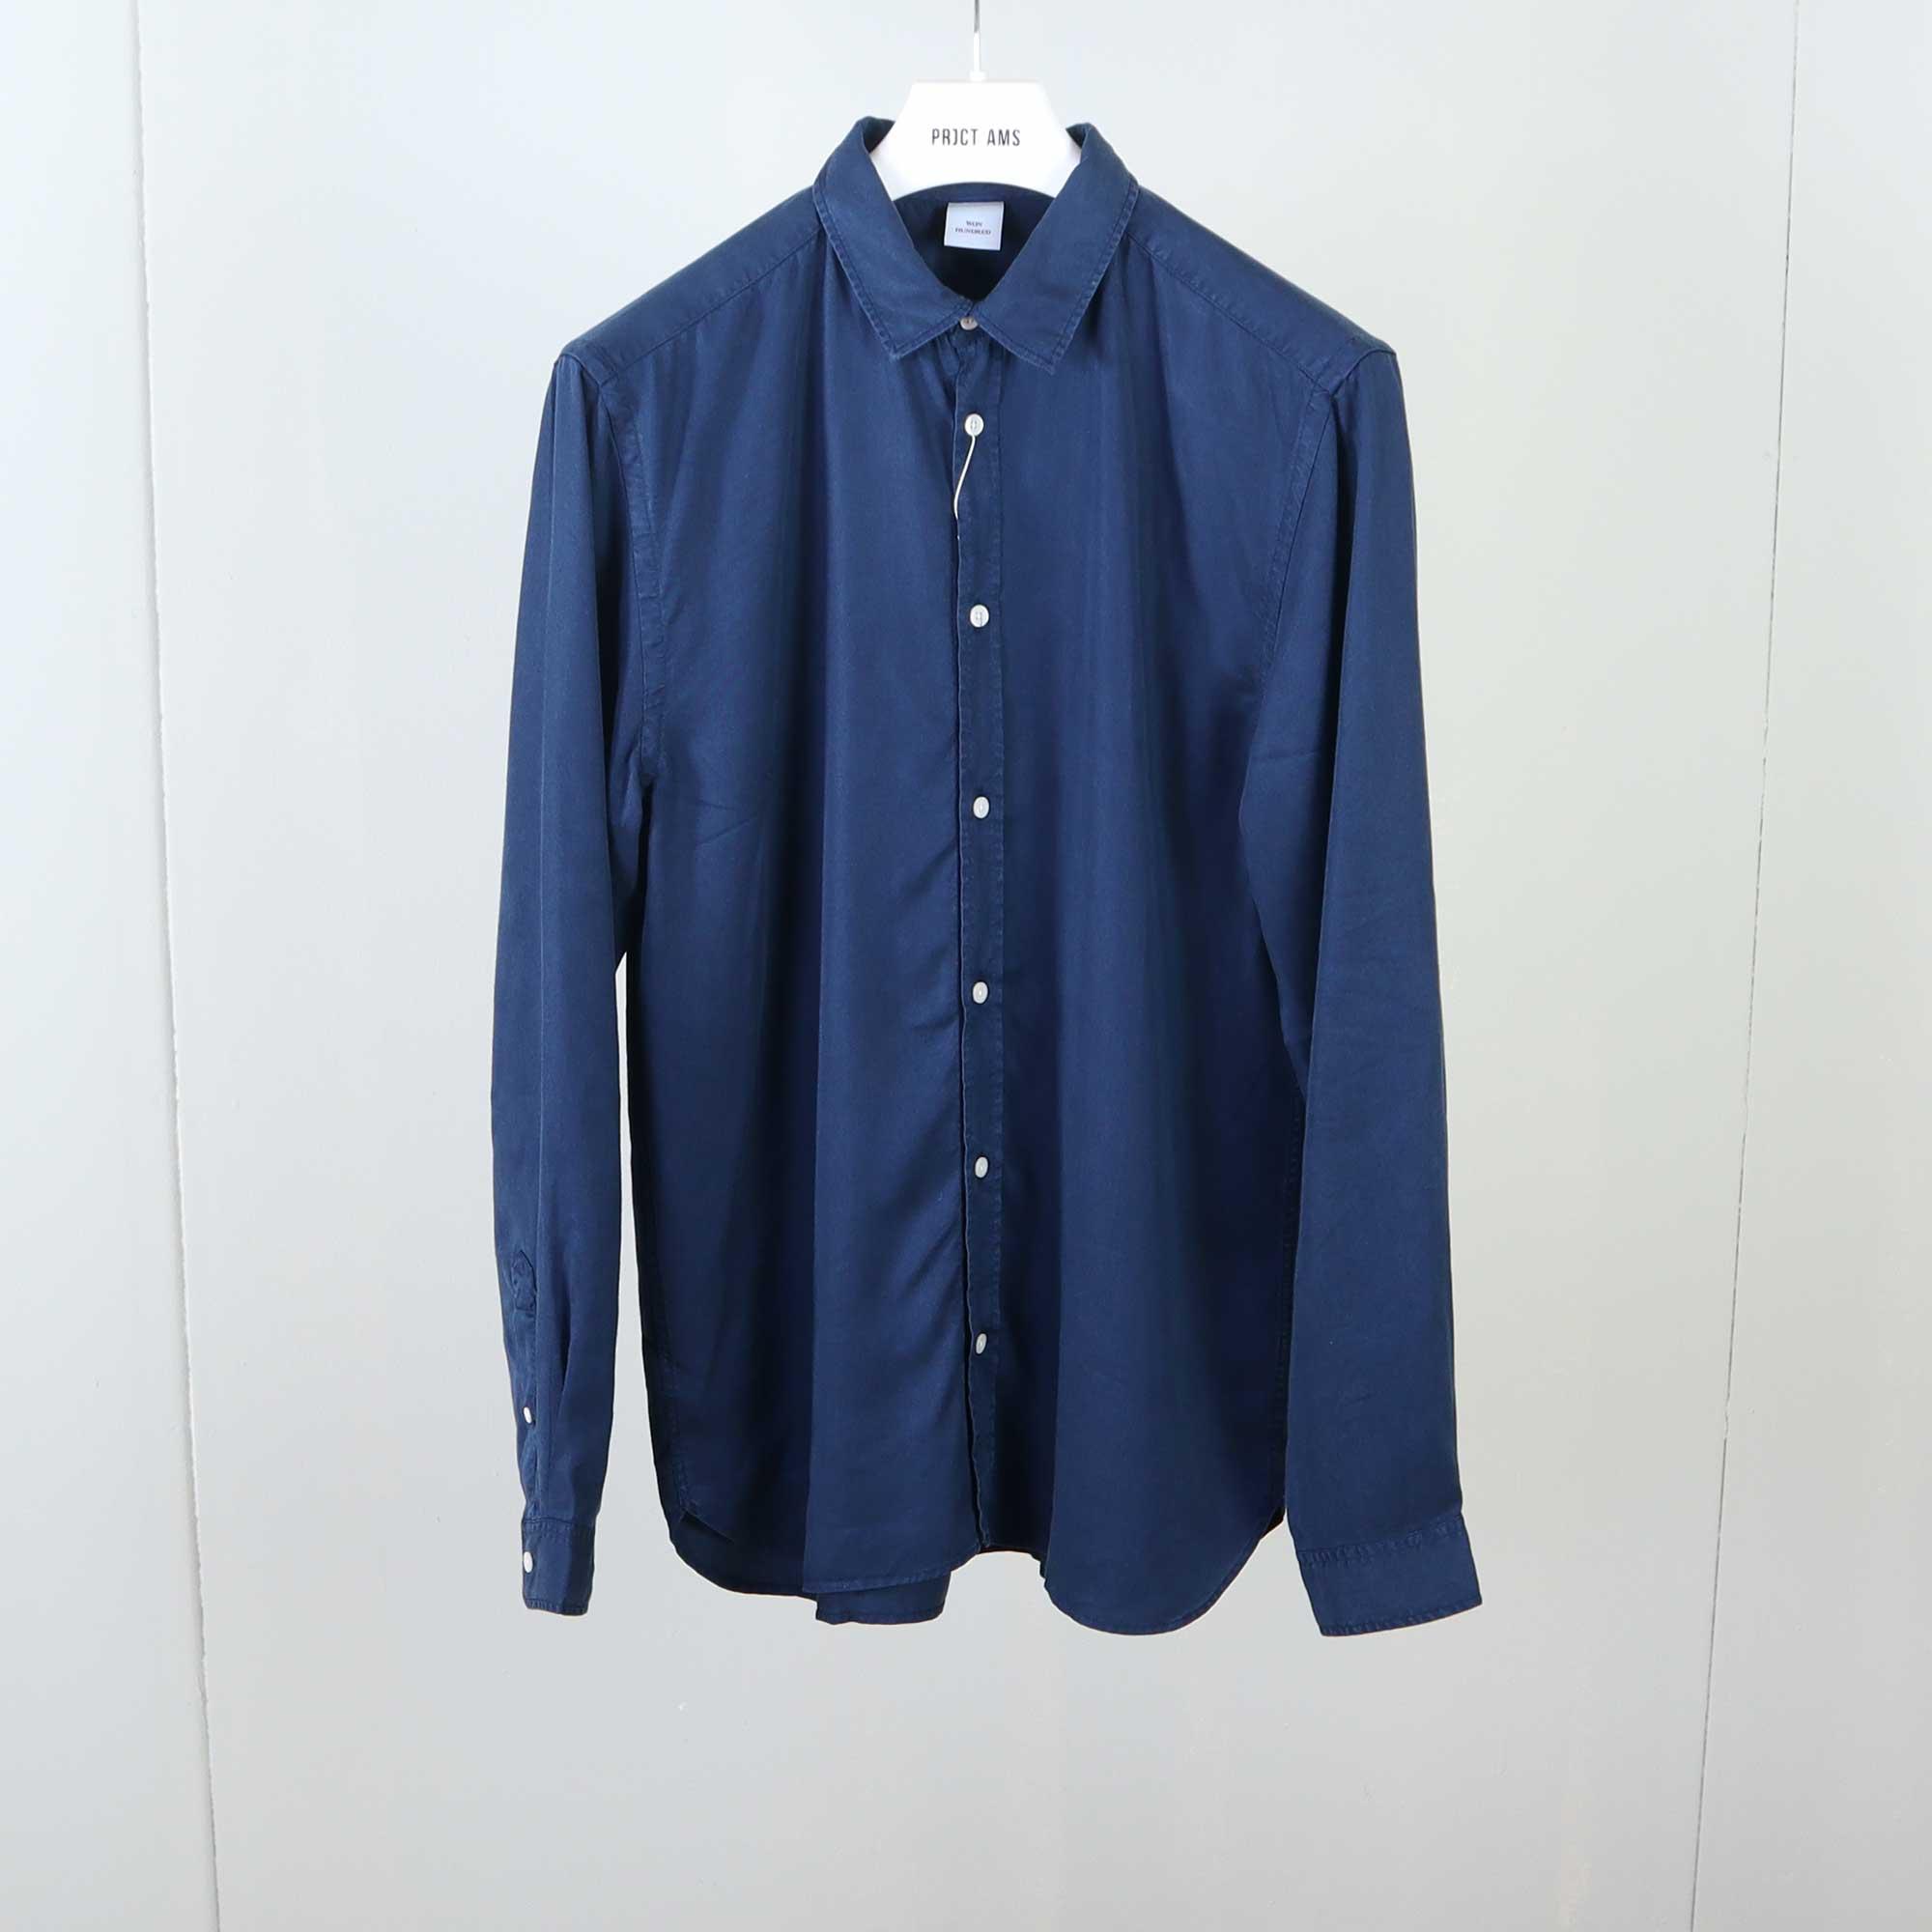 blouse-darkblue-7